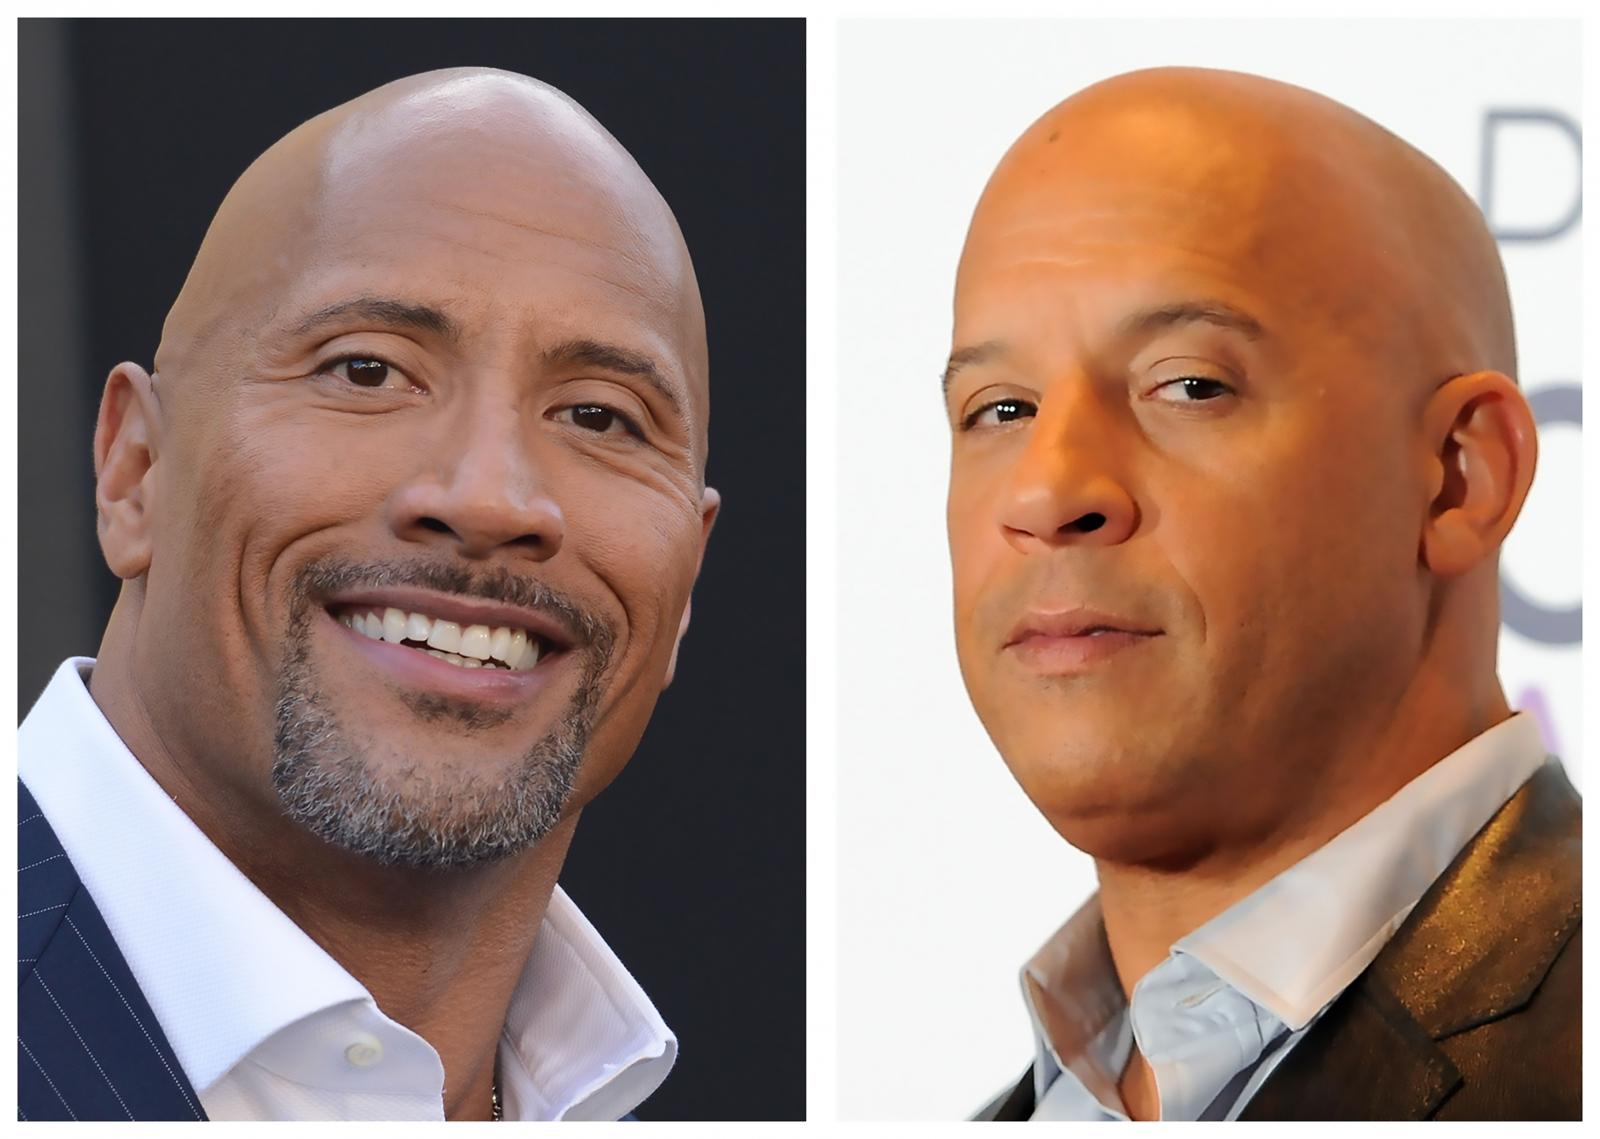 Dwayne Johnson and Vin Diesel